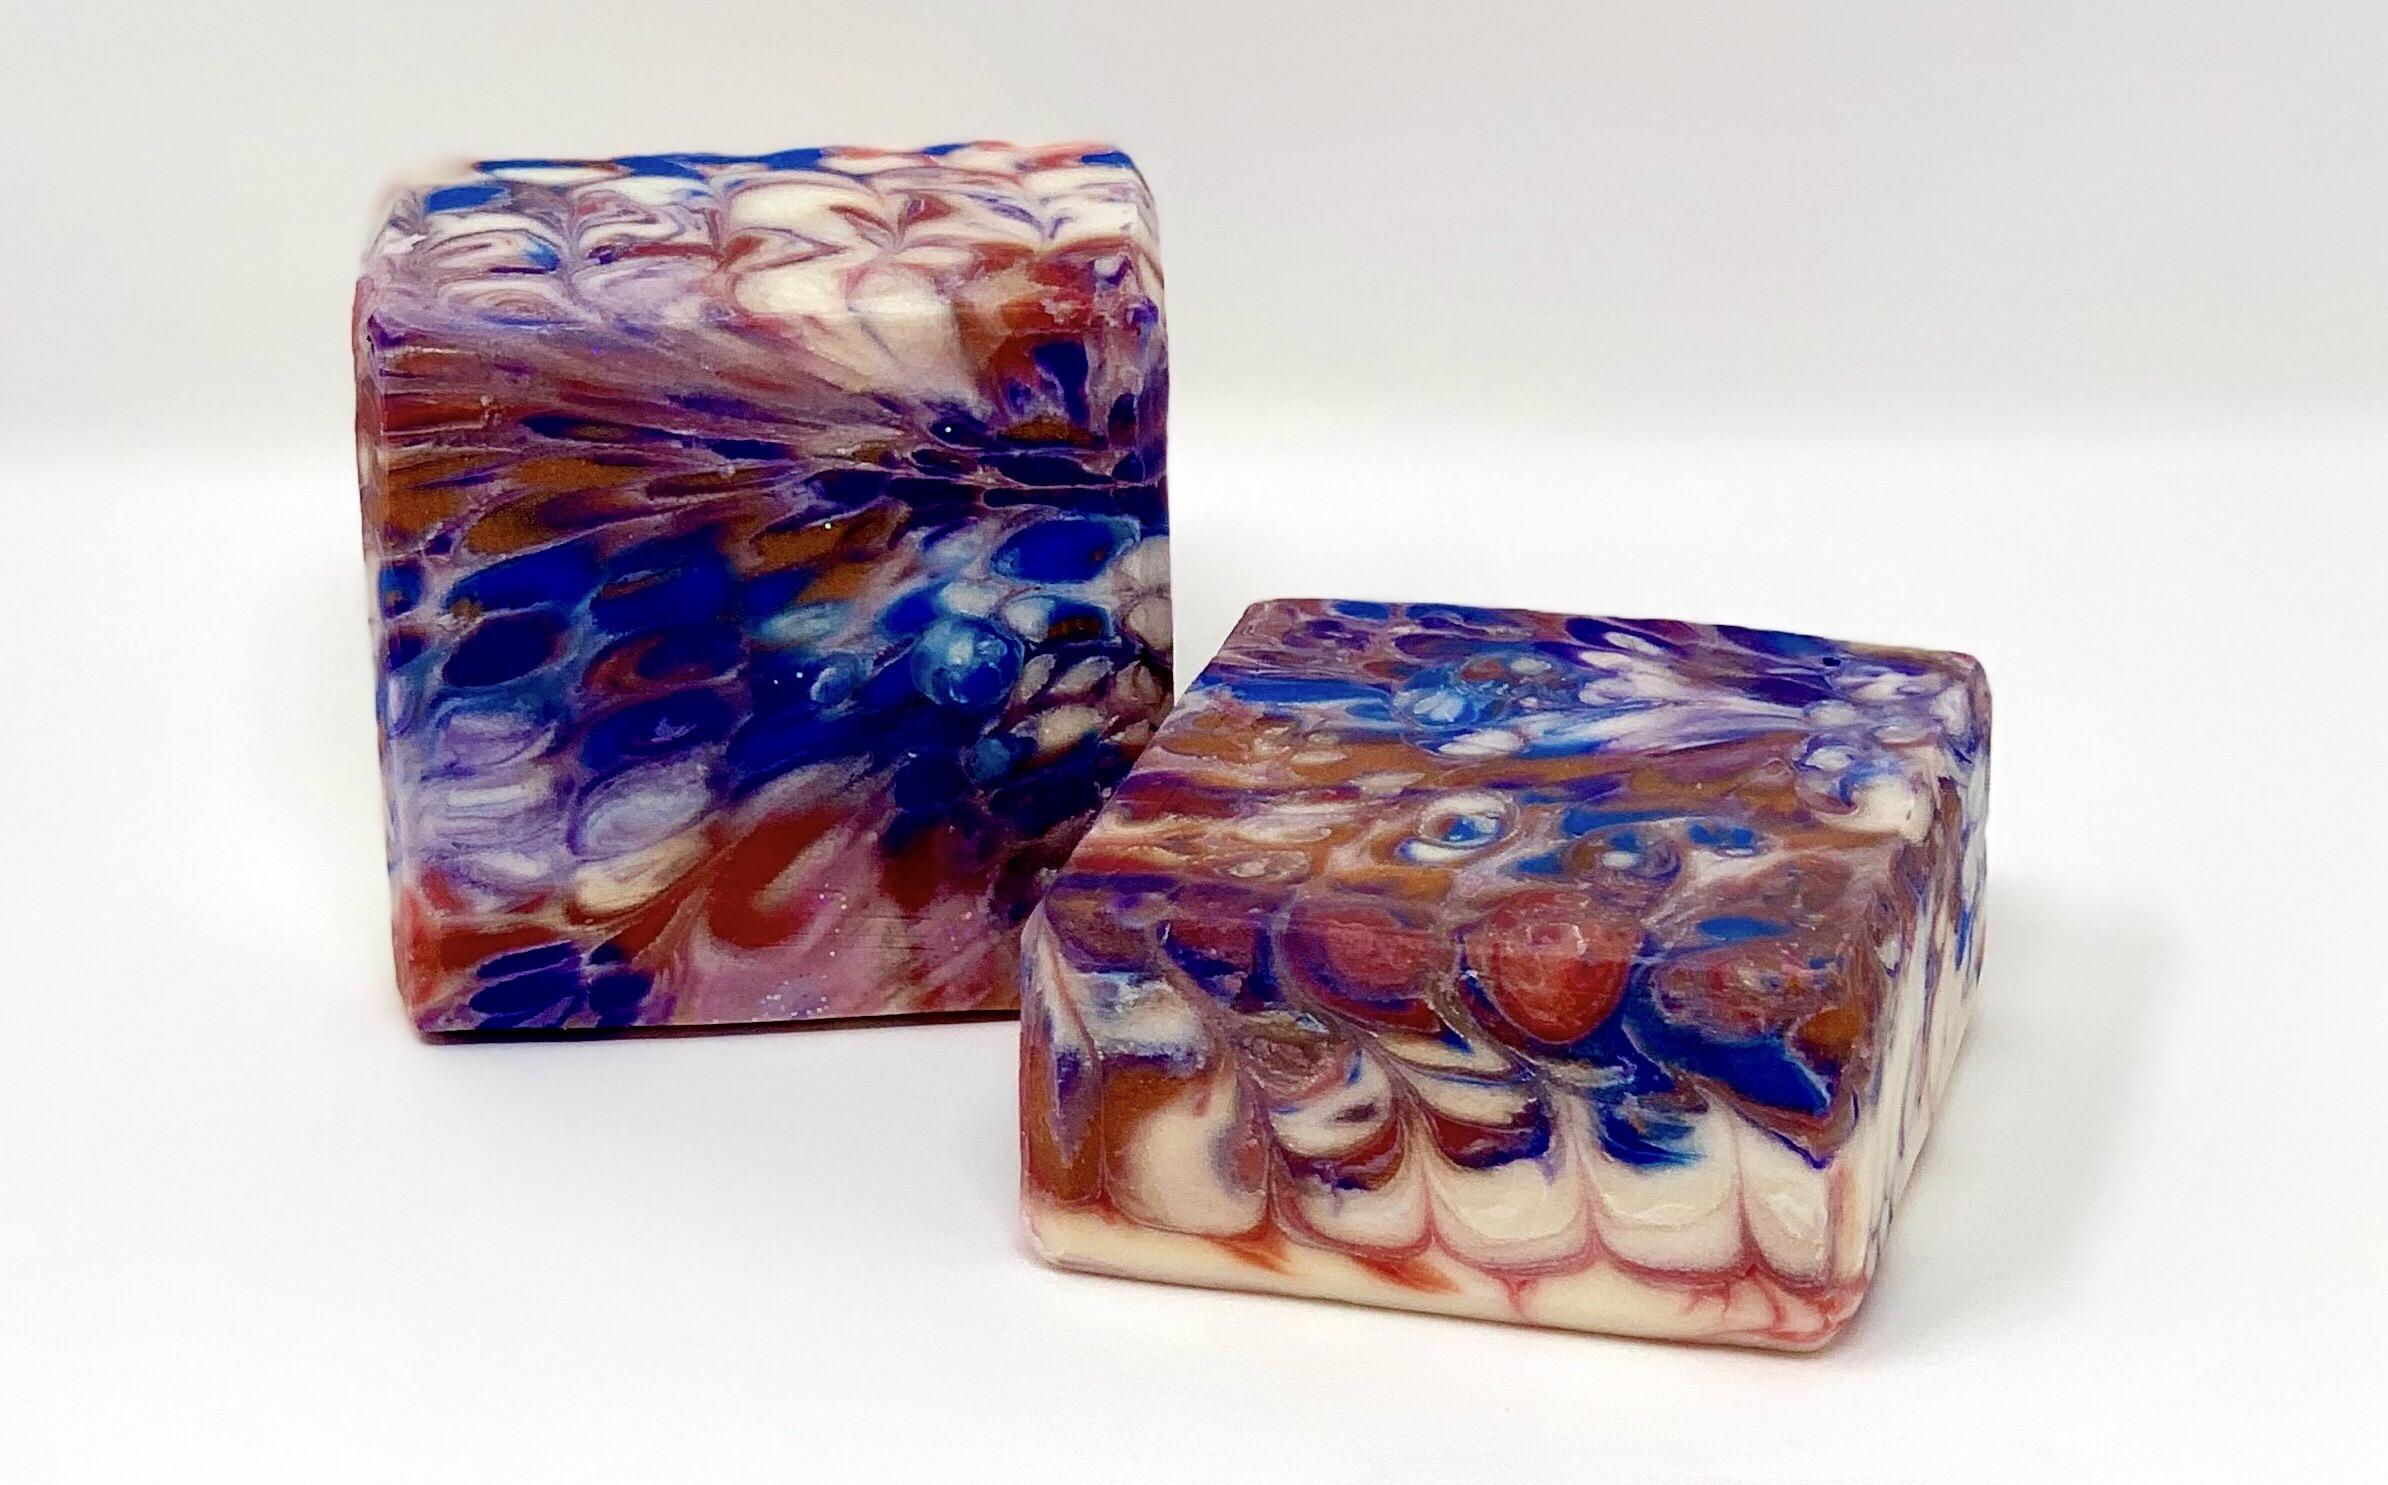 dainty doily soap